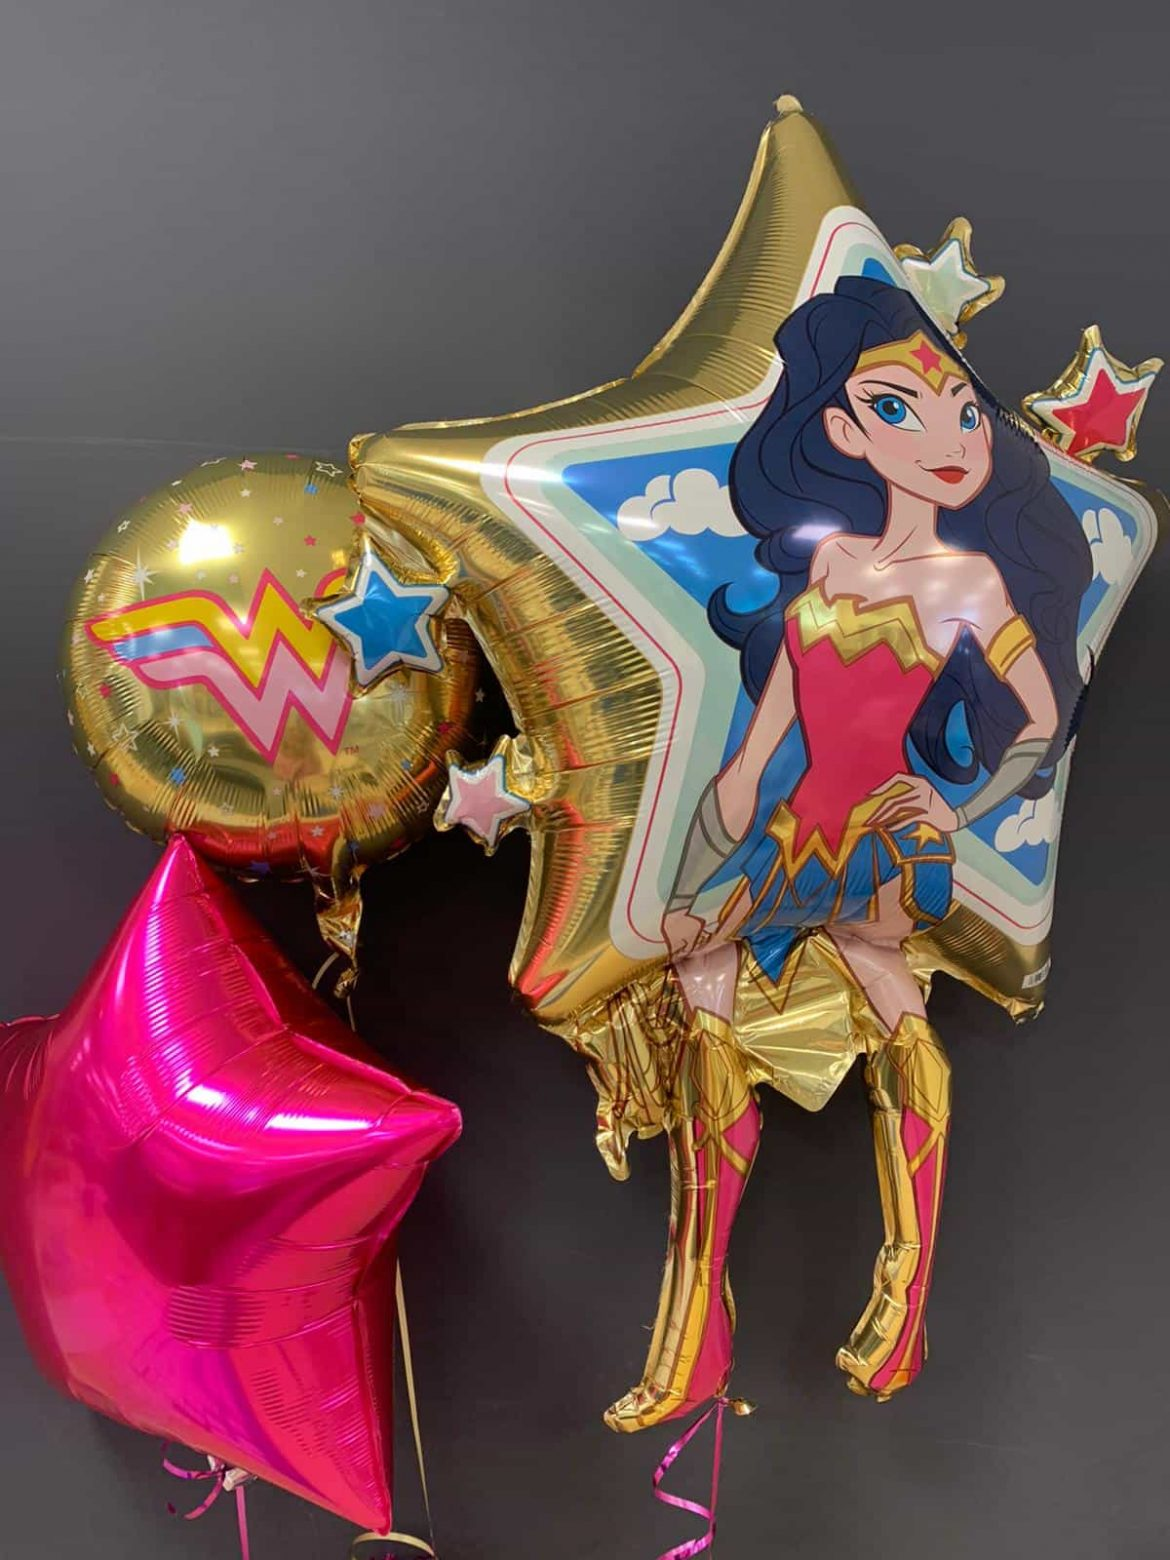 Wonderwoman € 8,90 <br>Dekoballons € 4,50<br>runder Ballon € 5,50 1